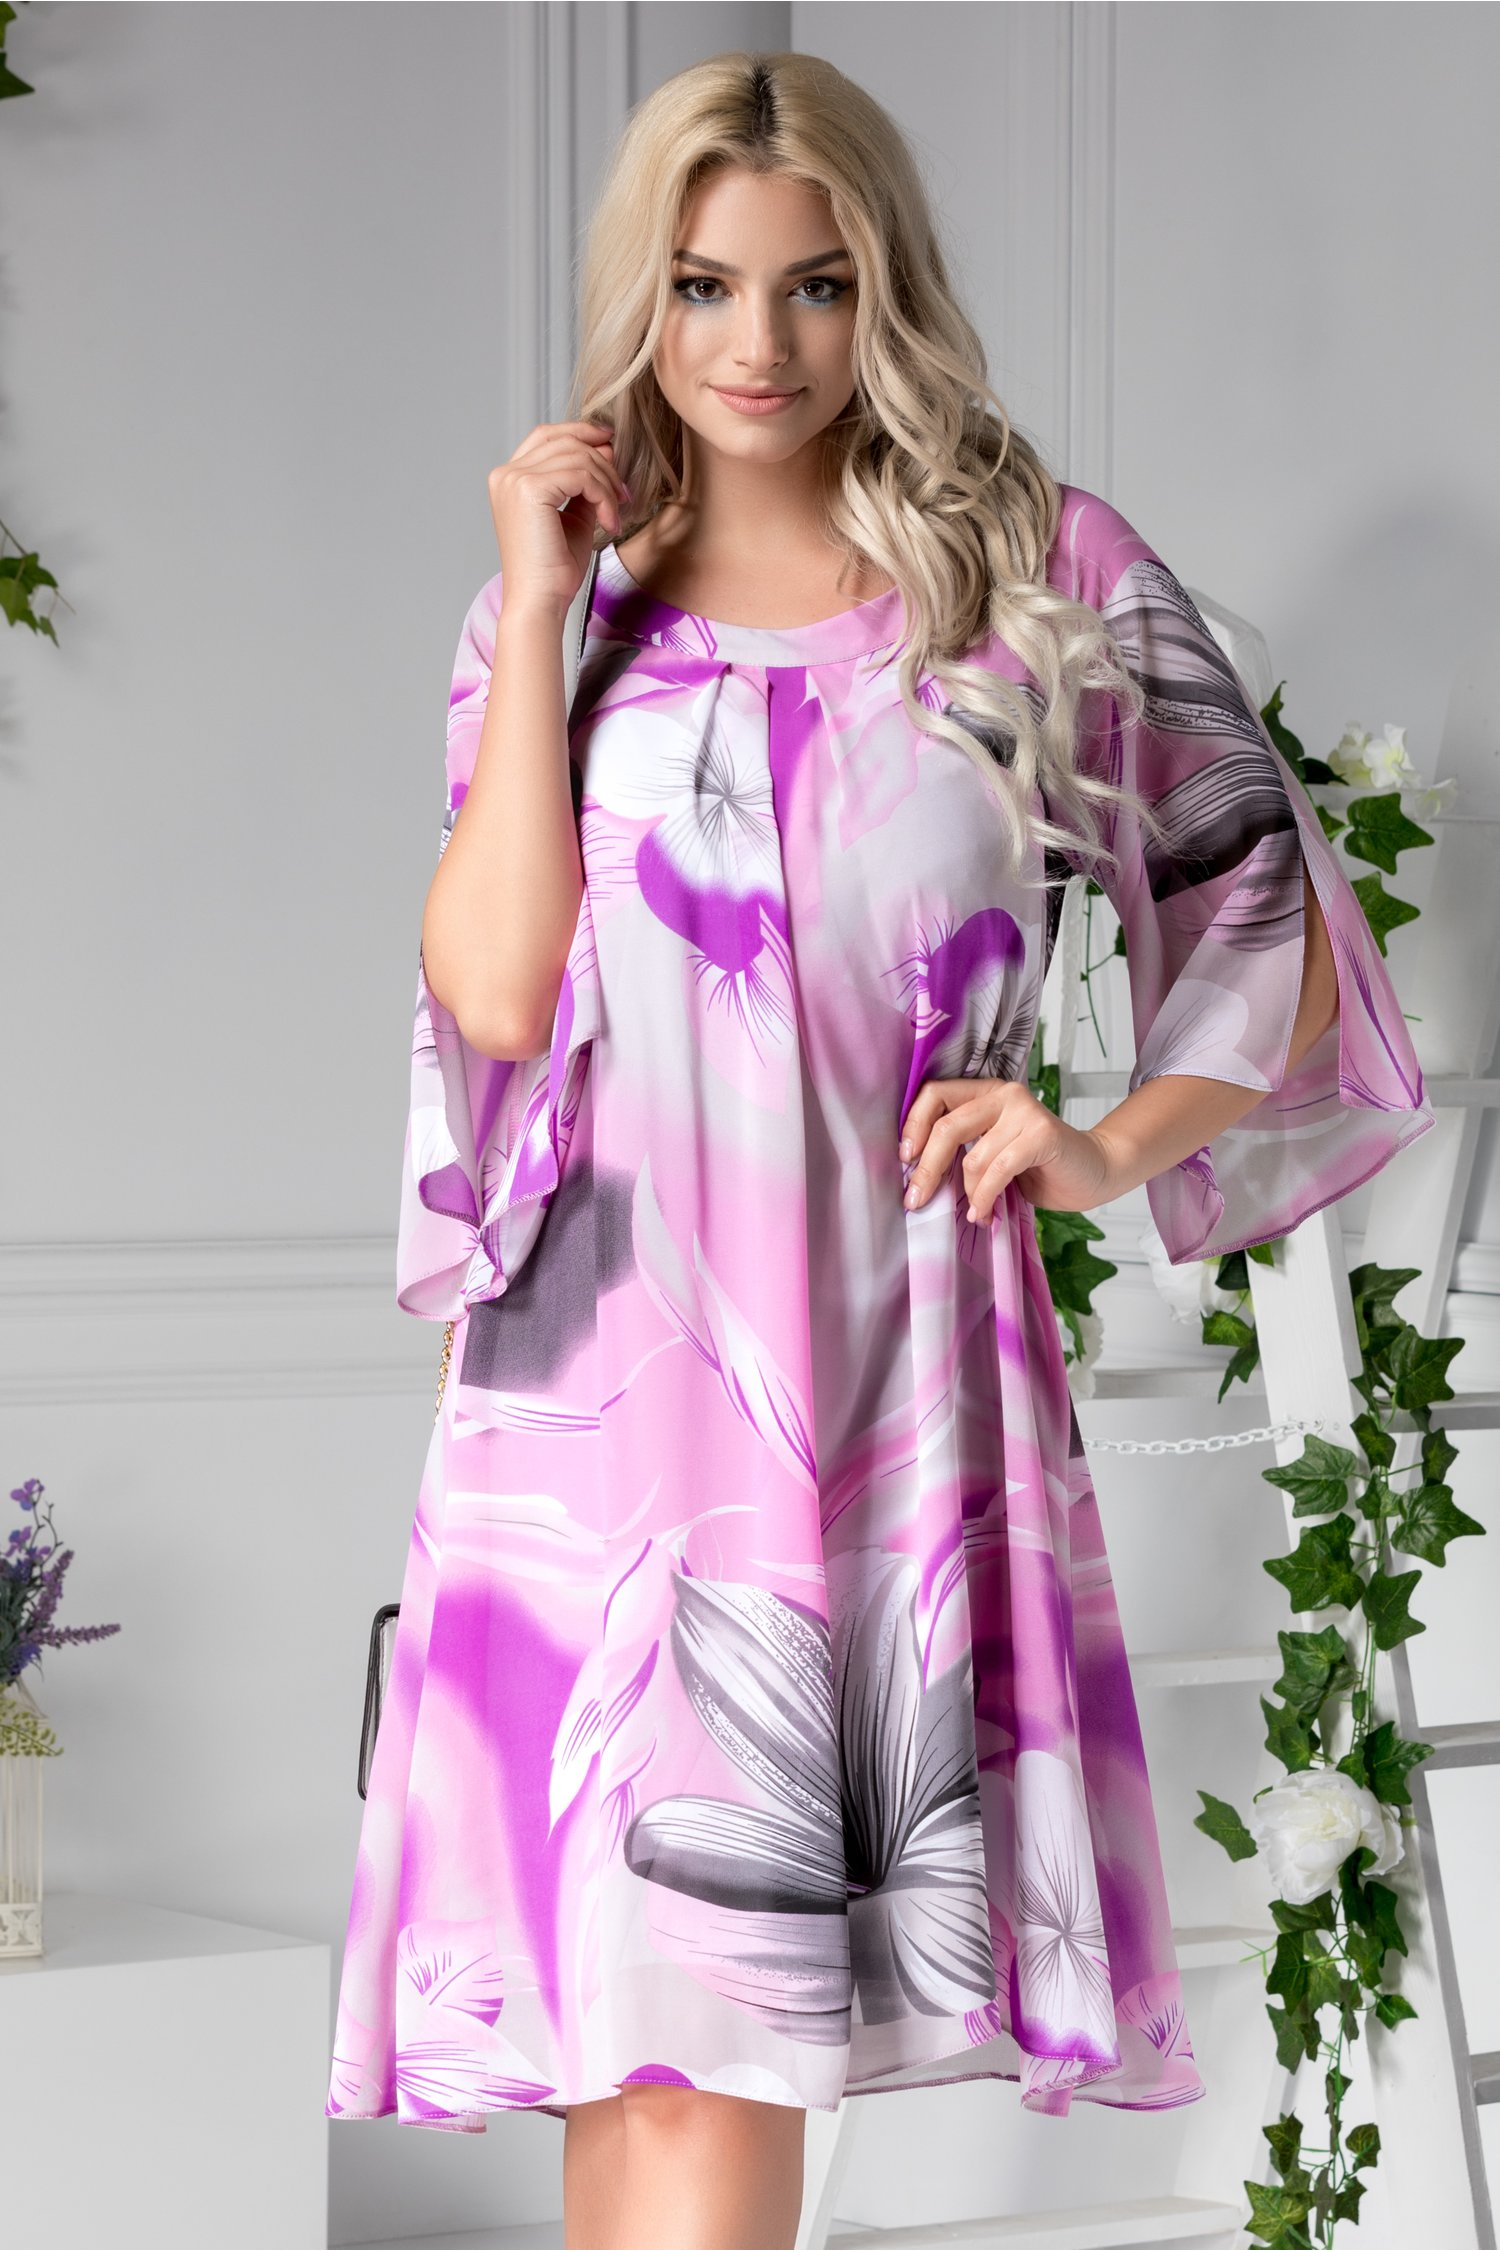 Rochie Lynette vaporoasa violet de zi